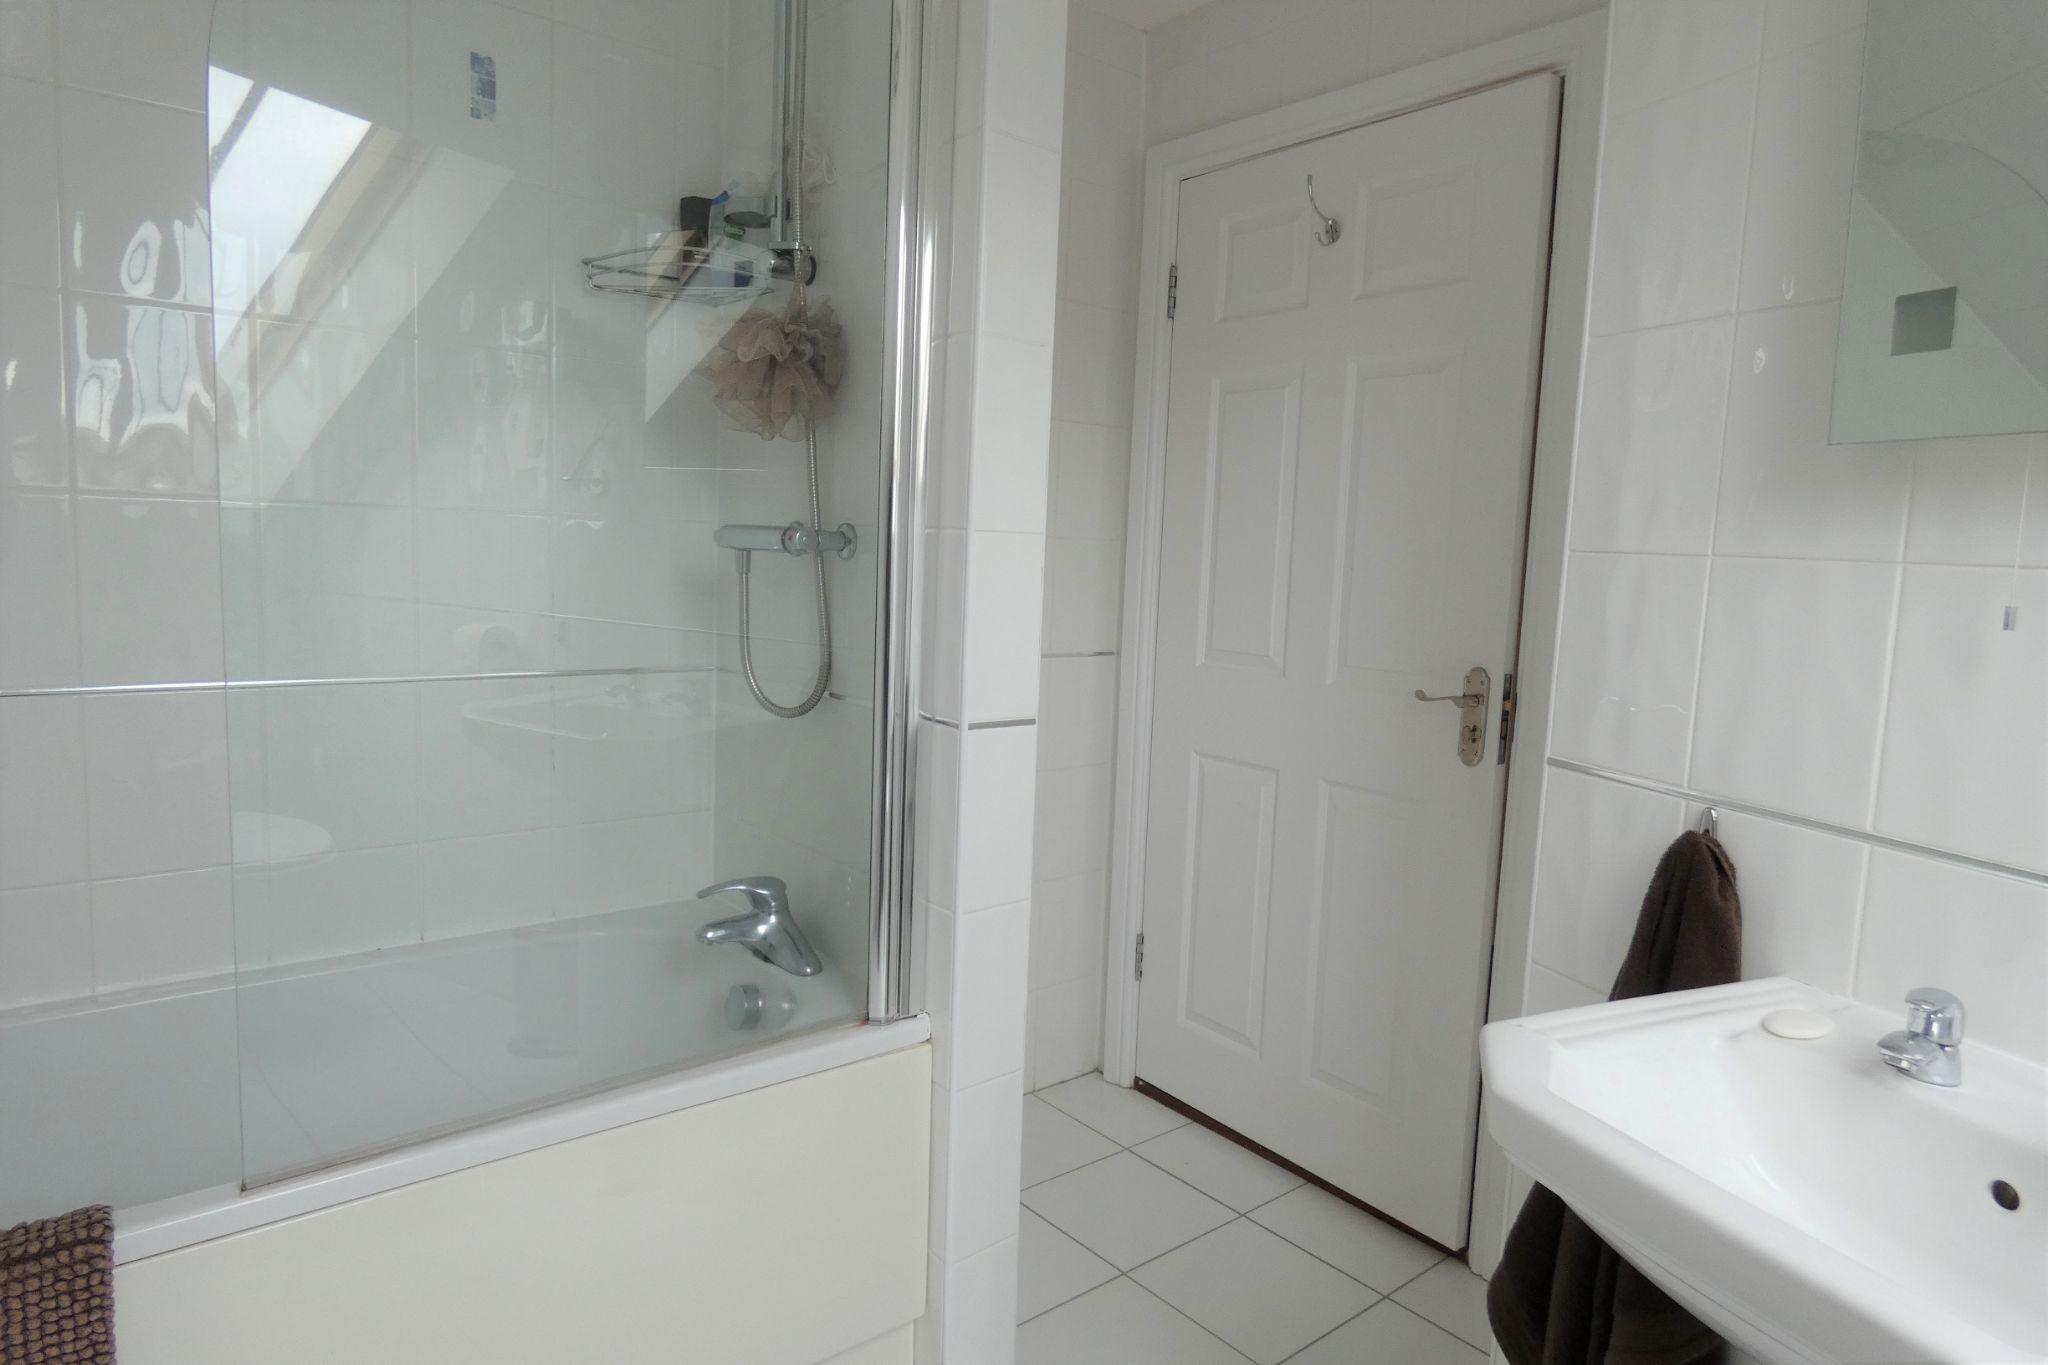 1 bedroom apartment flat/apartment SSTC in Peel - Photograph 8